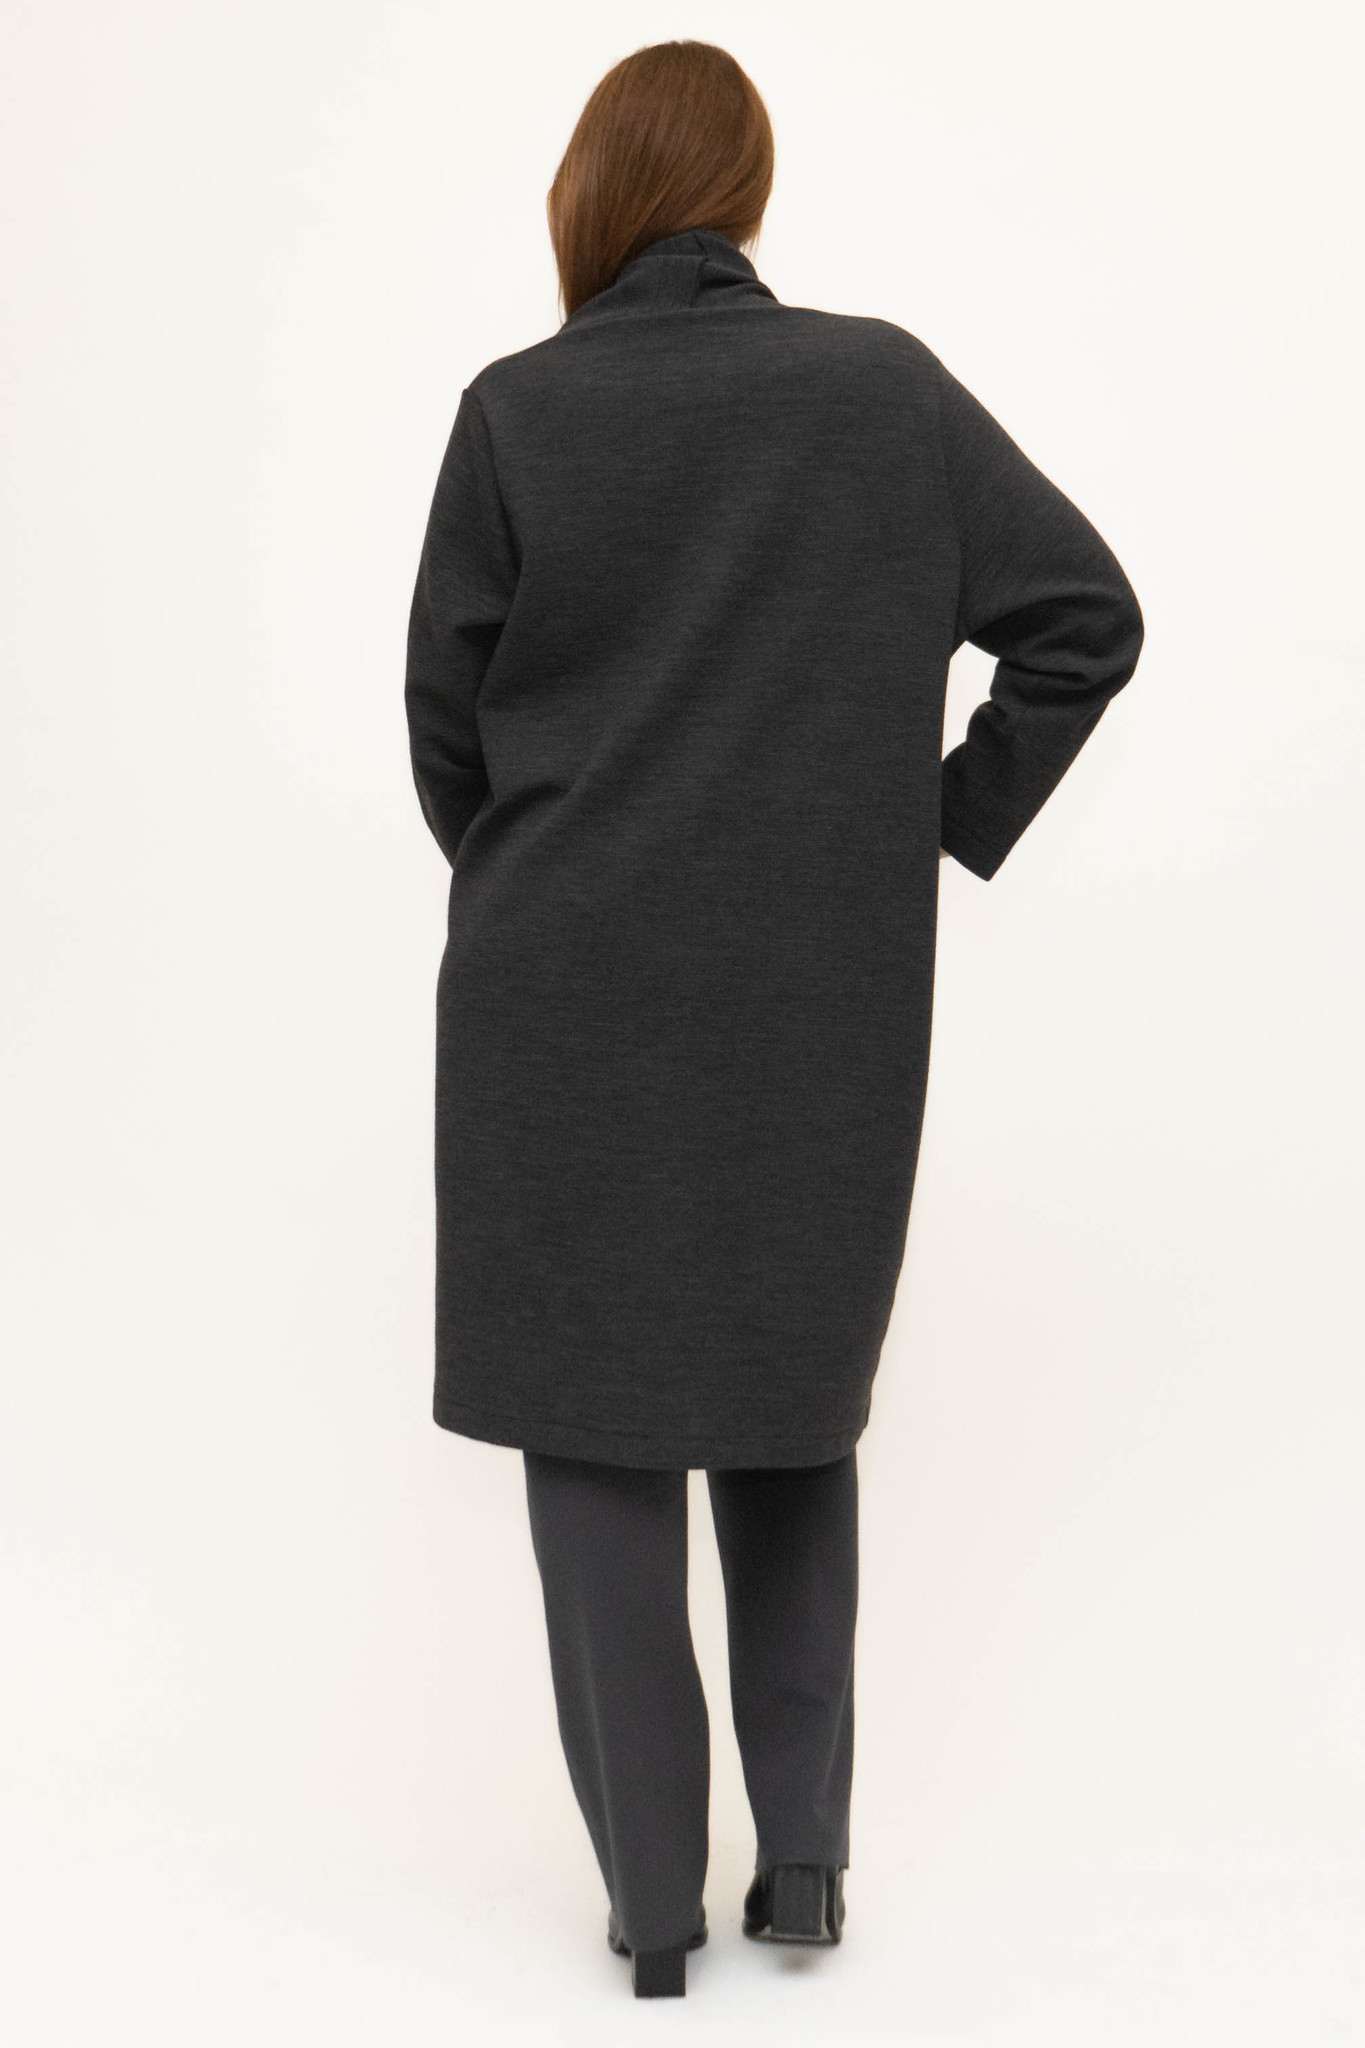 PHILIA Cardigan in Polyester-Virgin Wool blend-3